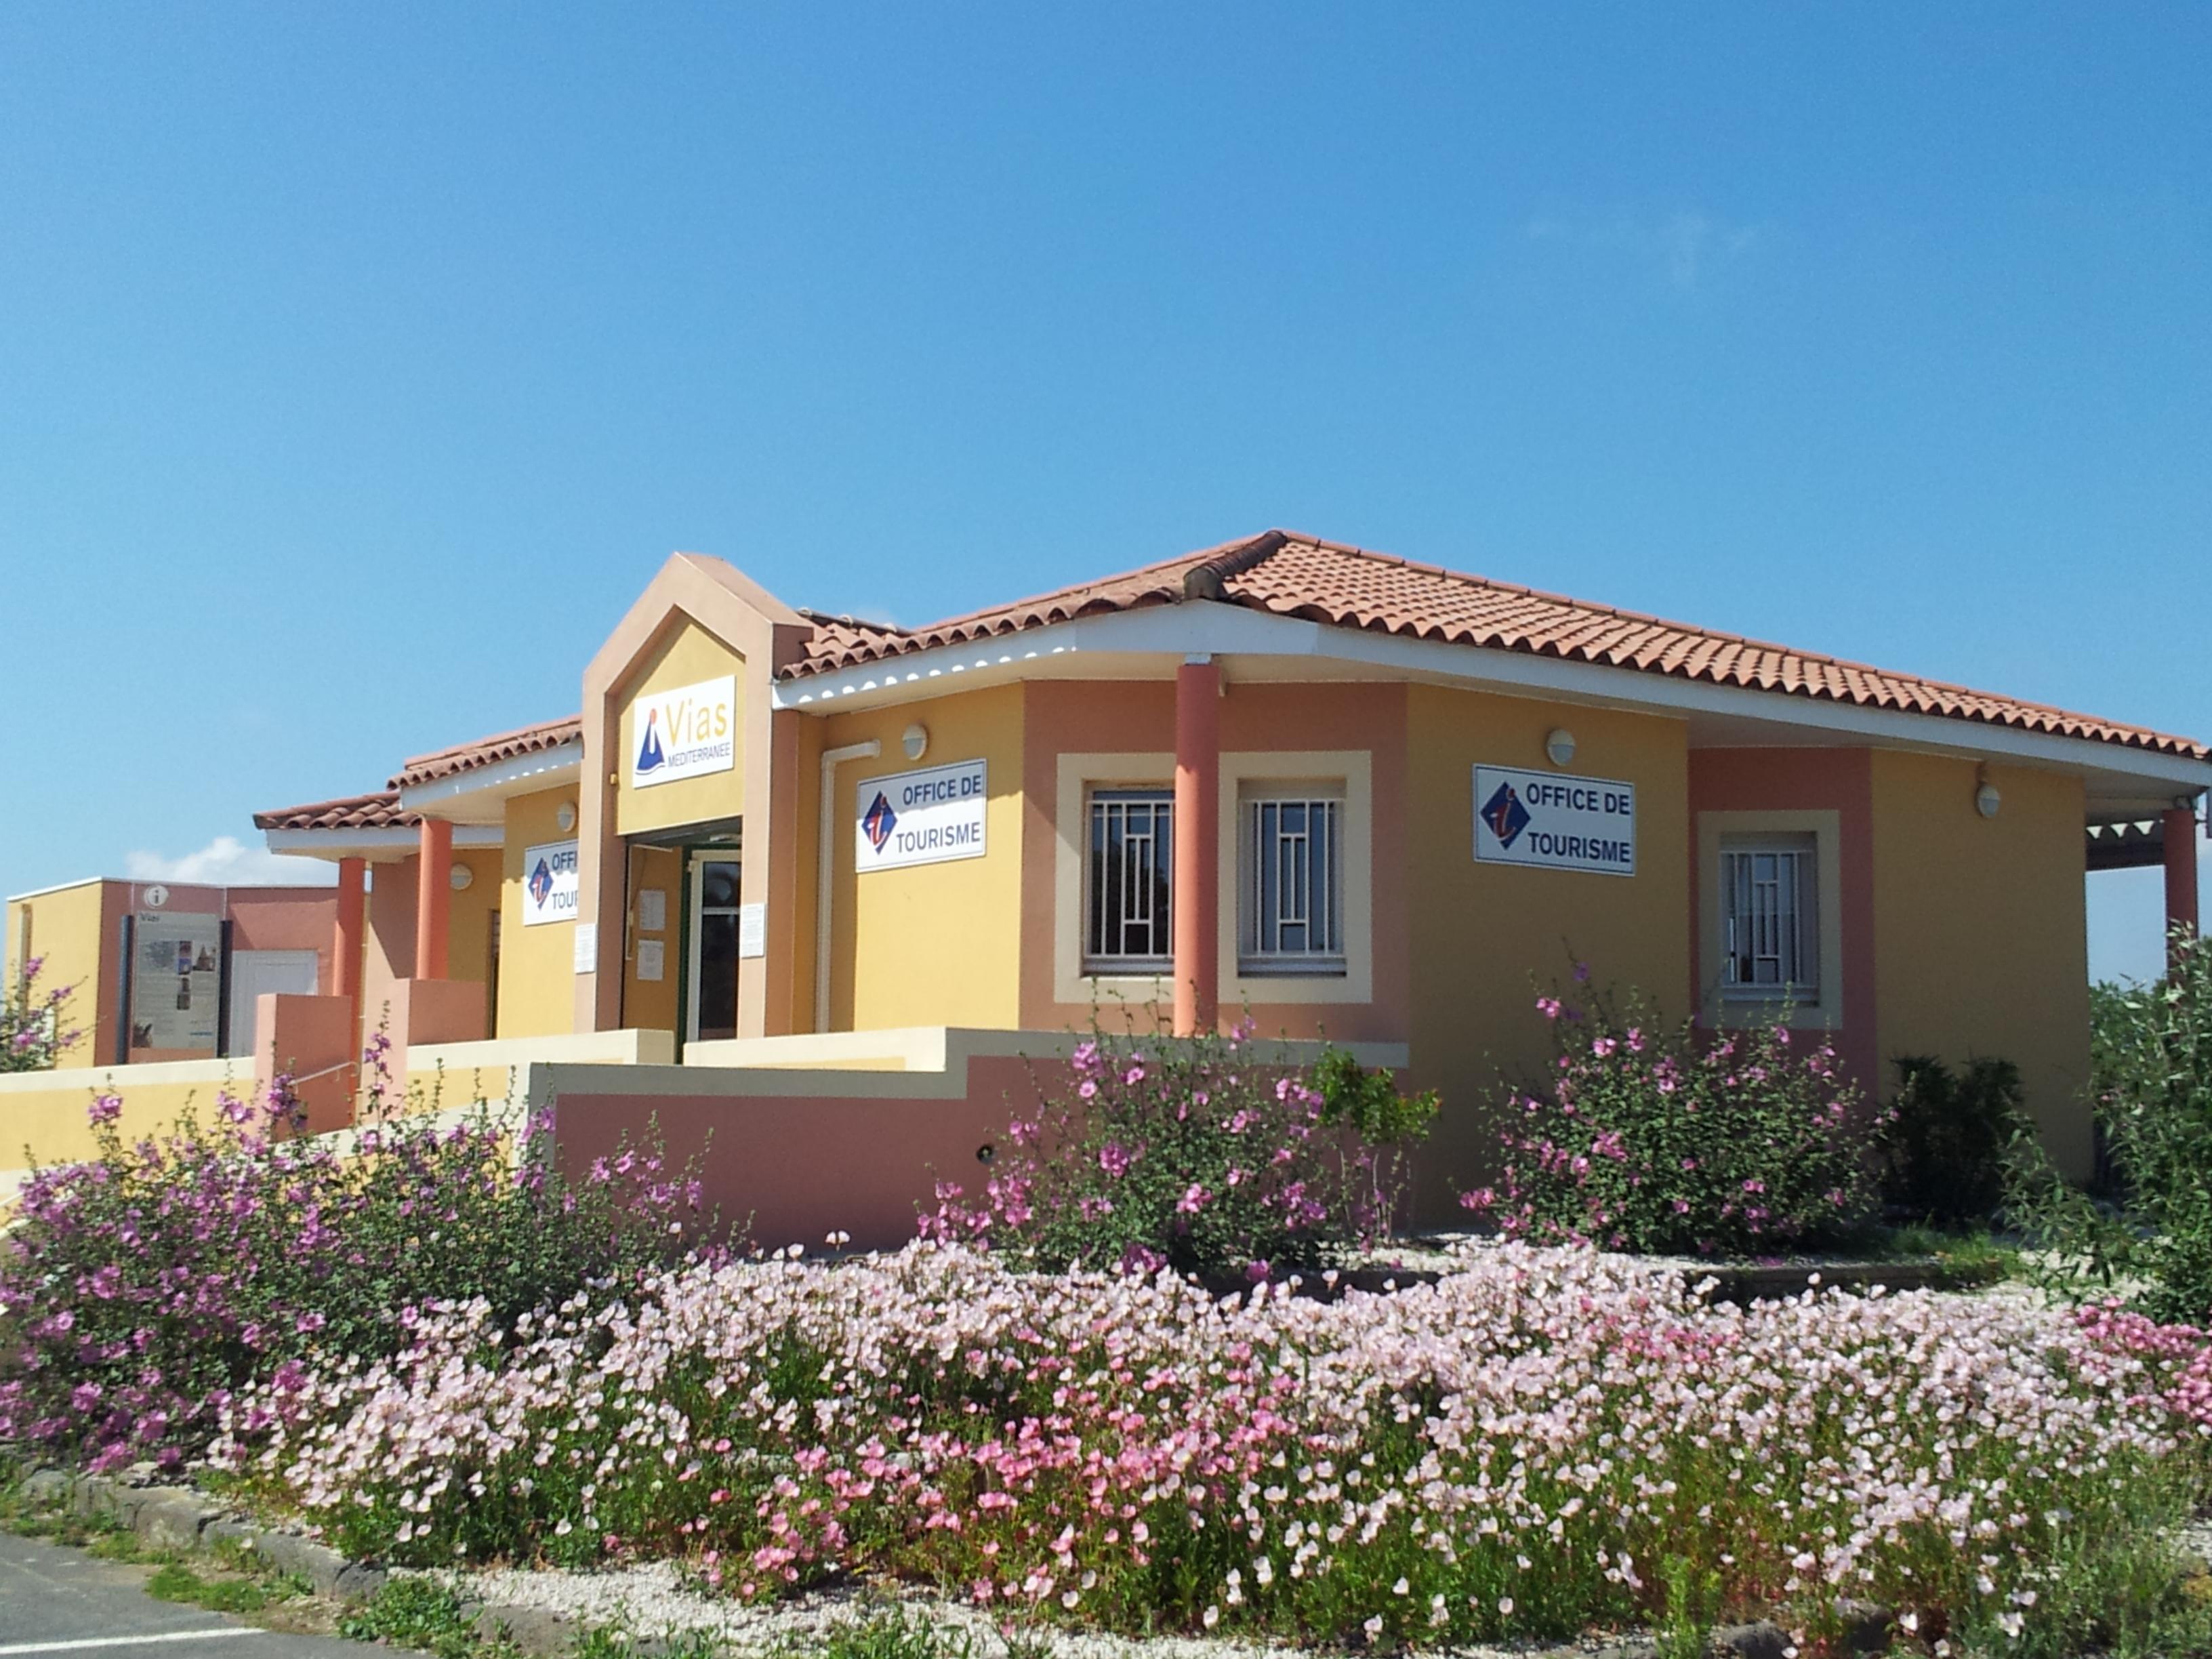 Office de tourisme cap d 39 agde mediterranee bit vias vias - Office du tourisme de vias ...